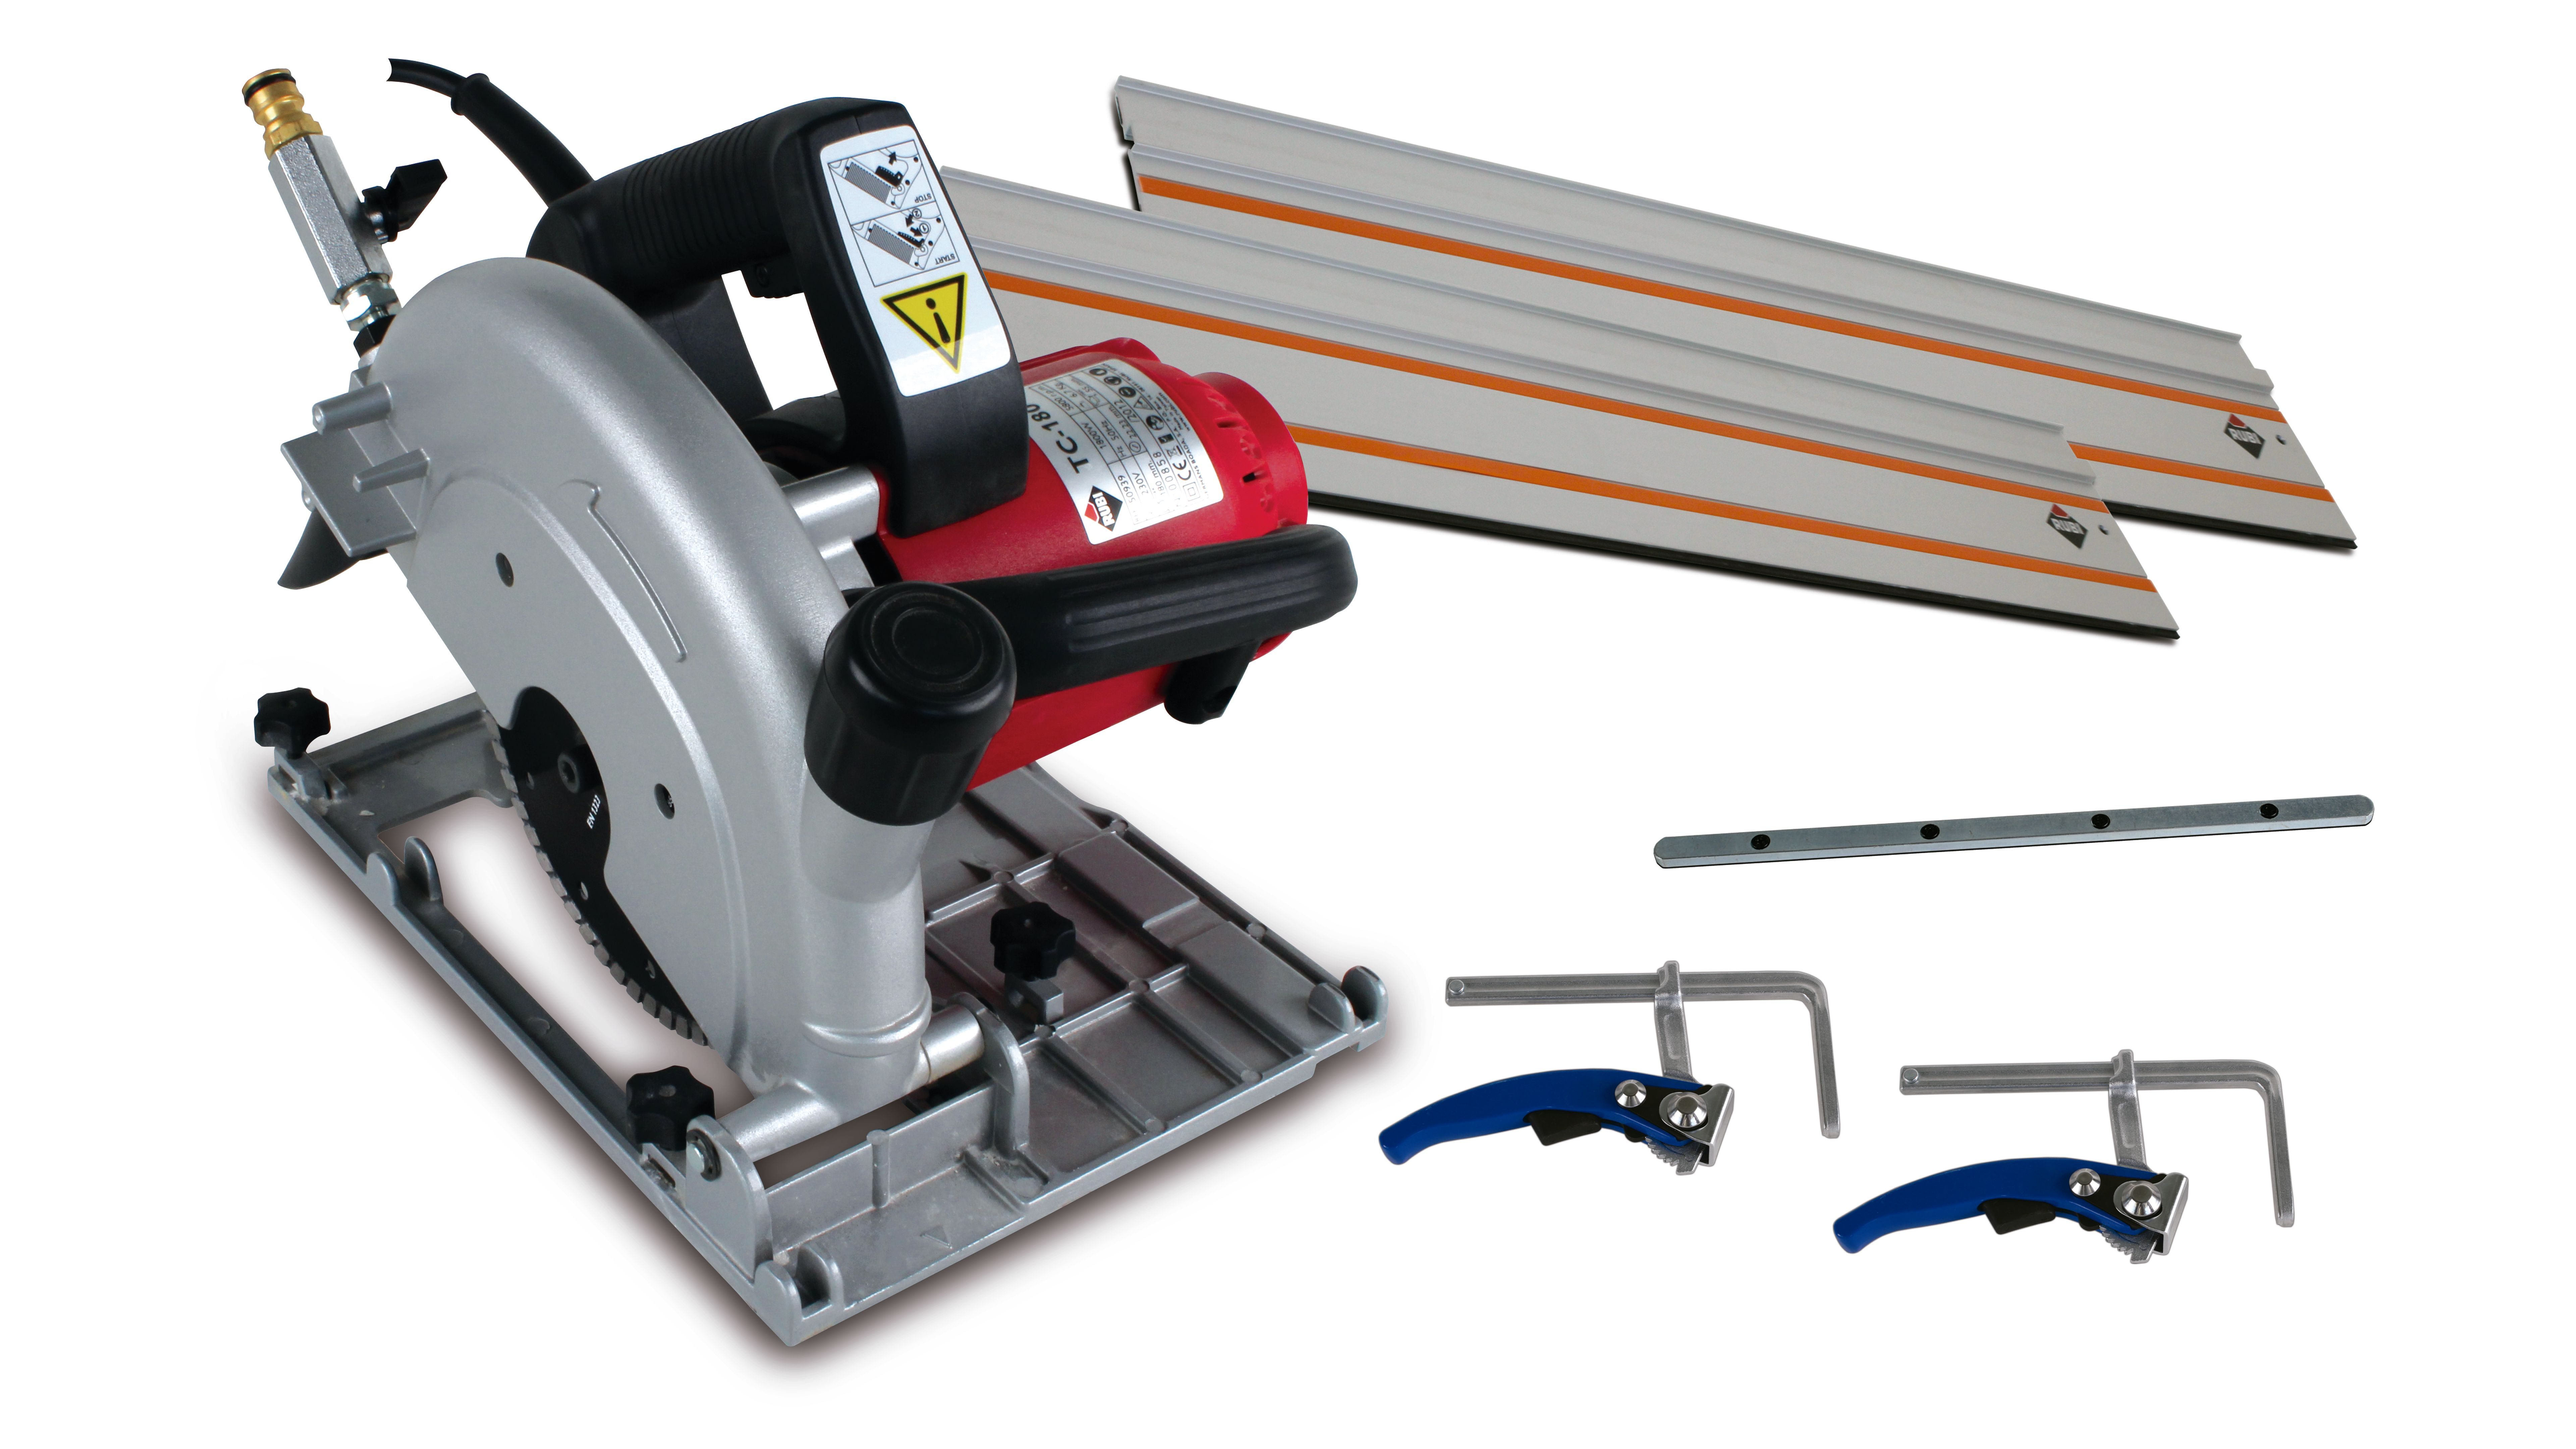 Rubi 50994 - TC-180 230V-50Hz 180mm Electric Circular Saw Kit